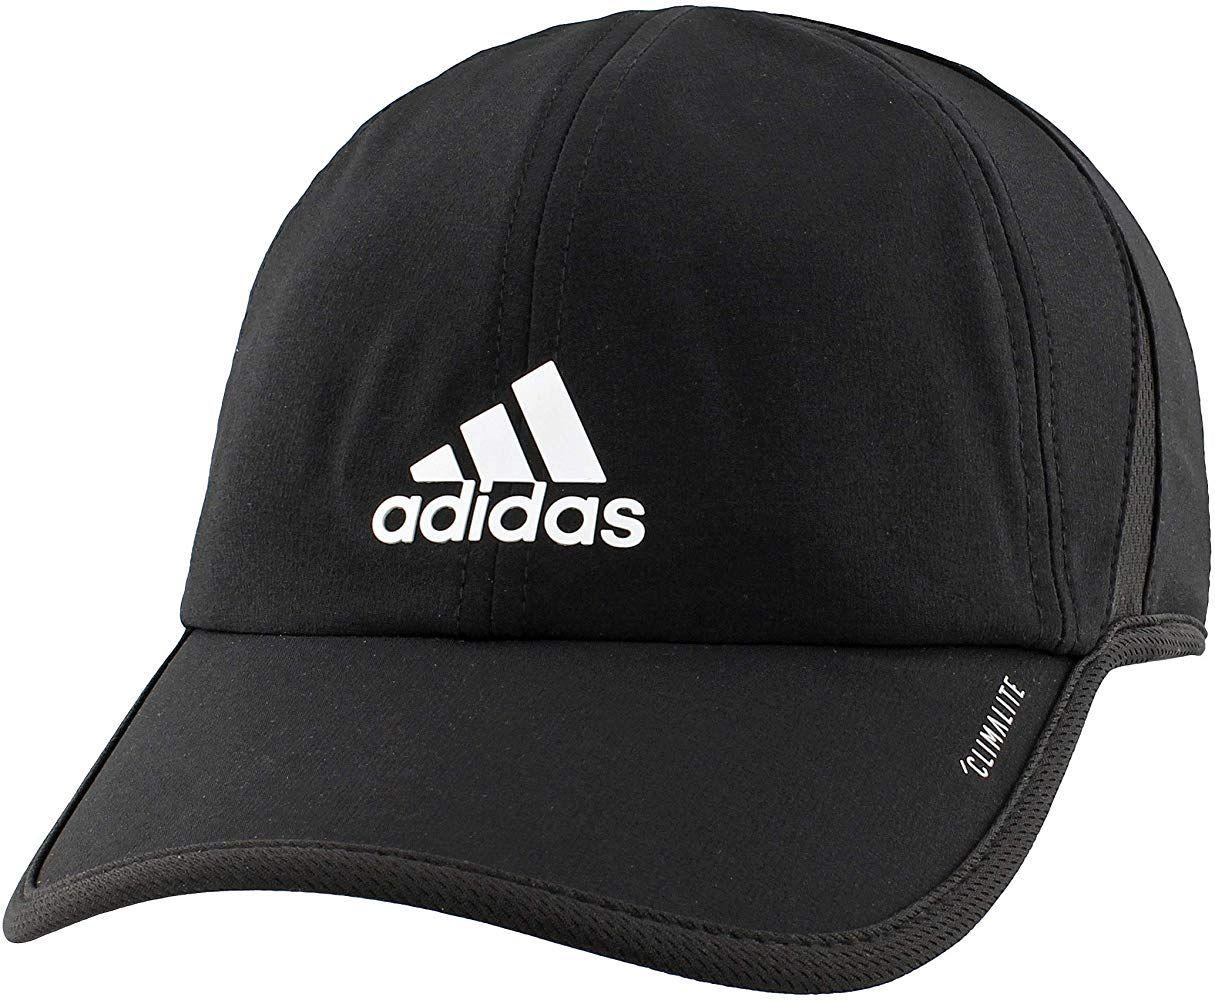 Amazon Com Adidas Men S Superlite Relaxed Adjustable Performance Cap Black White One Size Clothing In 2020 Adidas Men Adidas Cap Running Cap